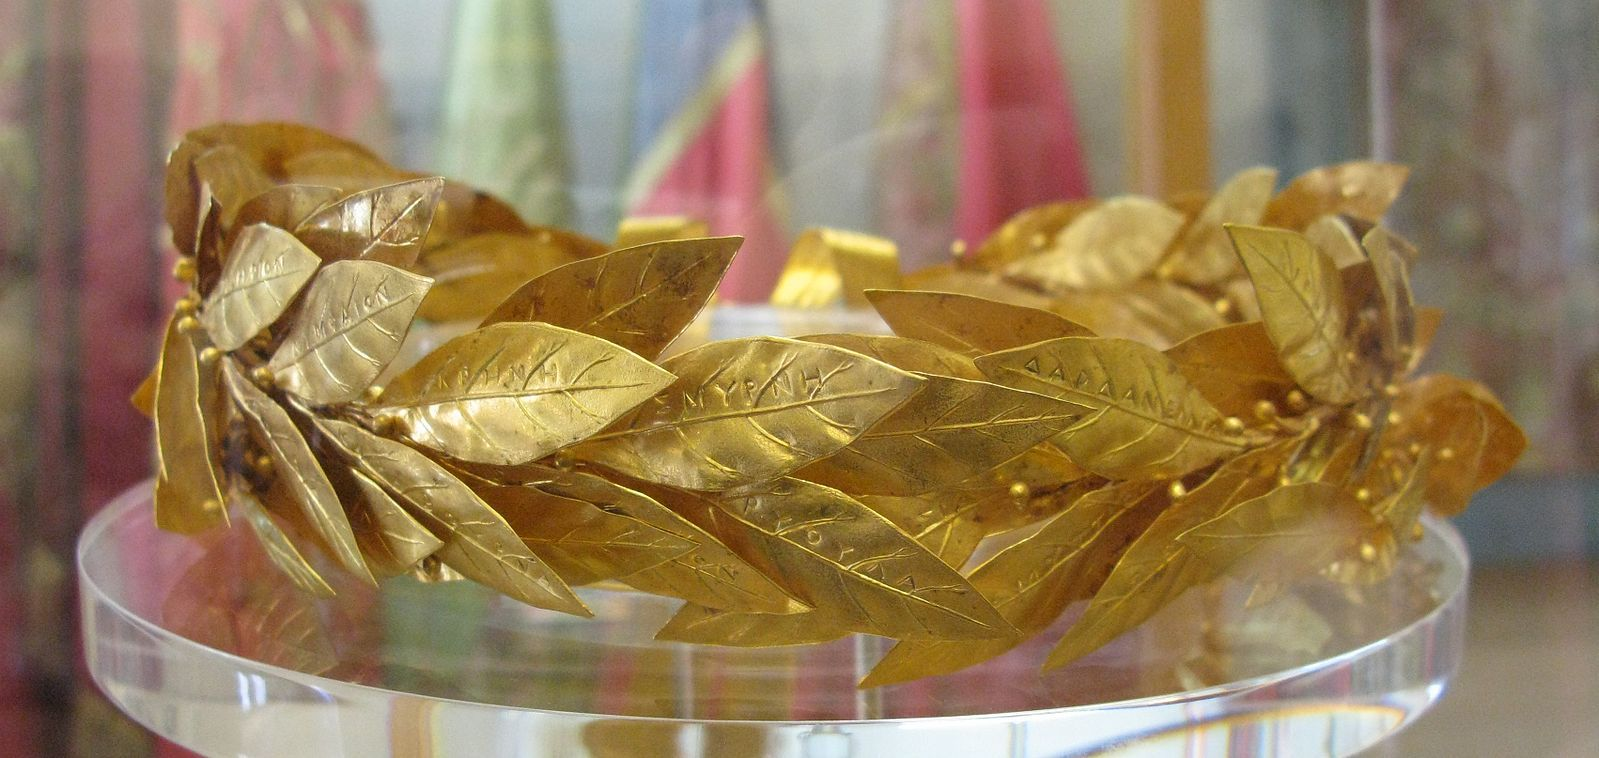 File:Golden wreath of laurel leaves (4552508862).jpg